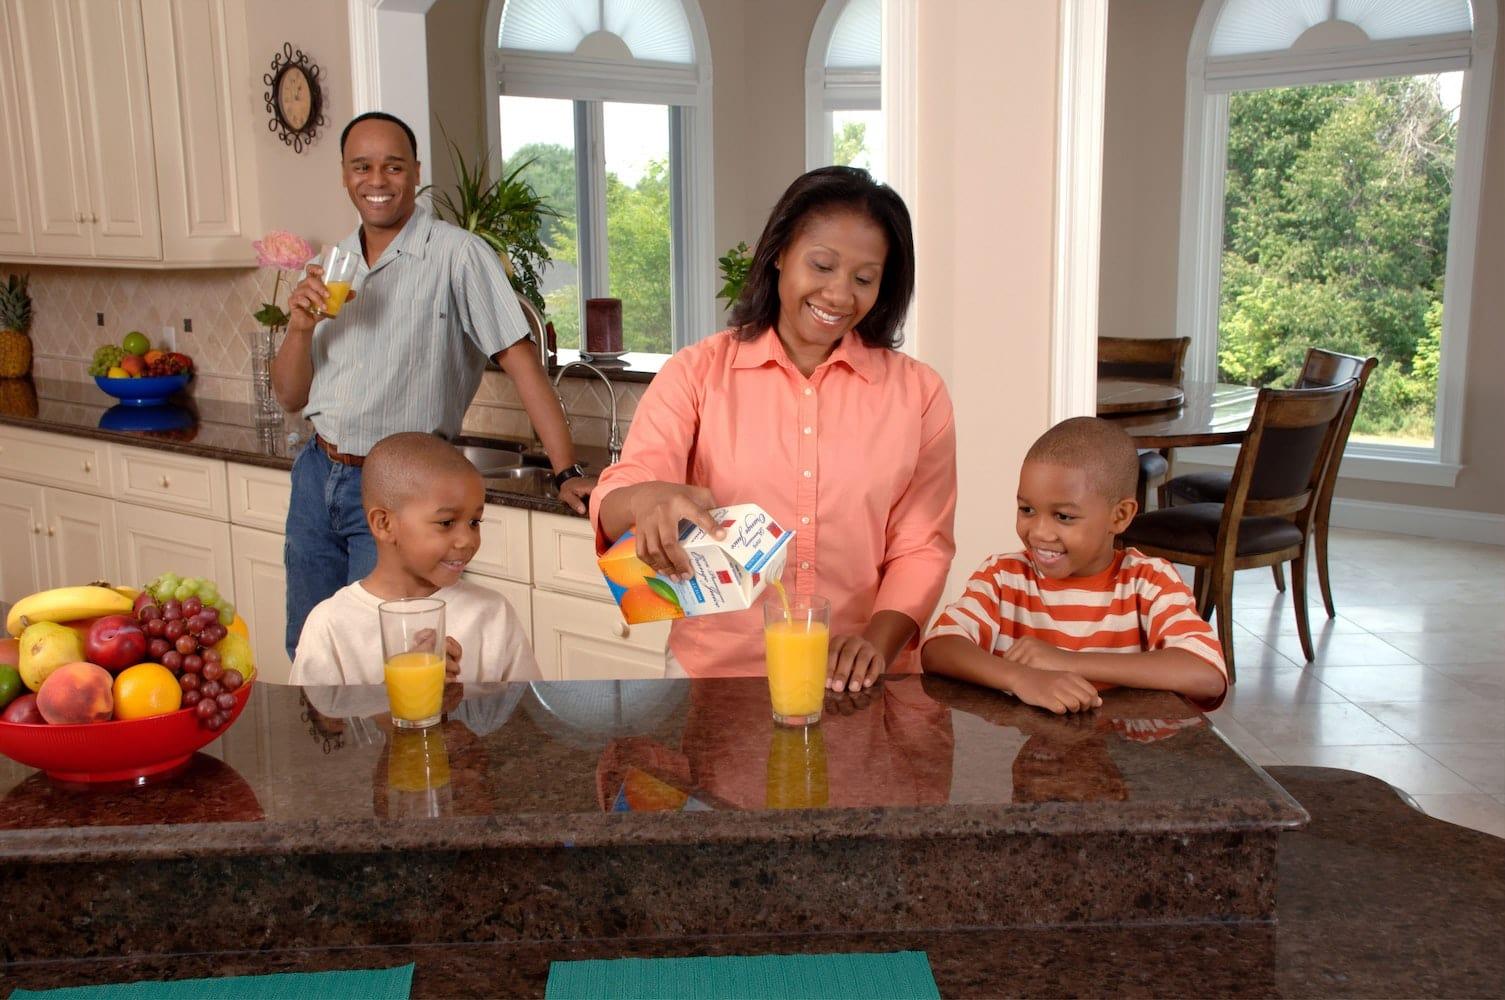 Family around a breakfast bar pouring orange juice